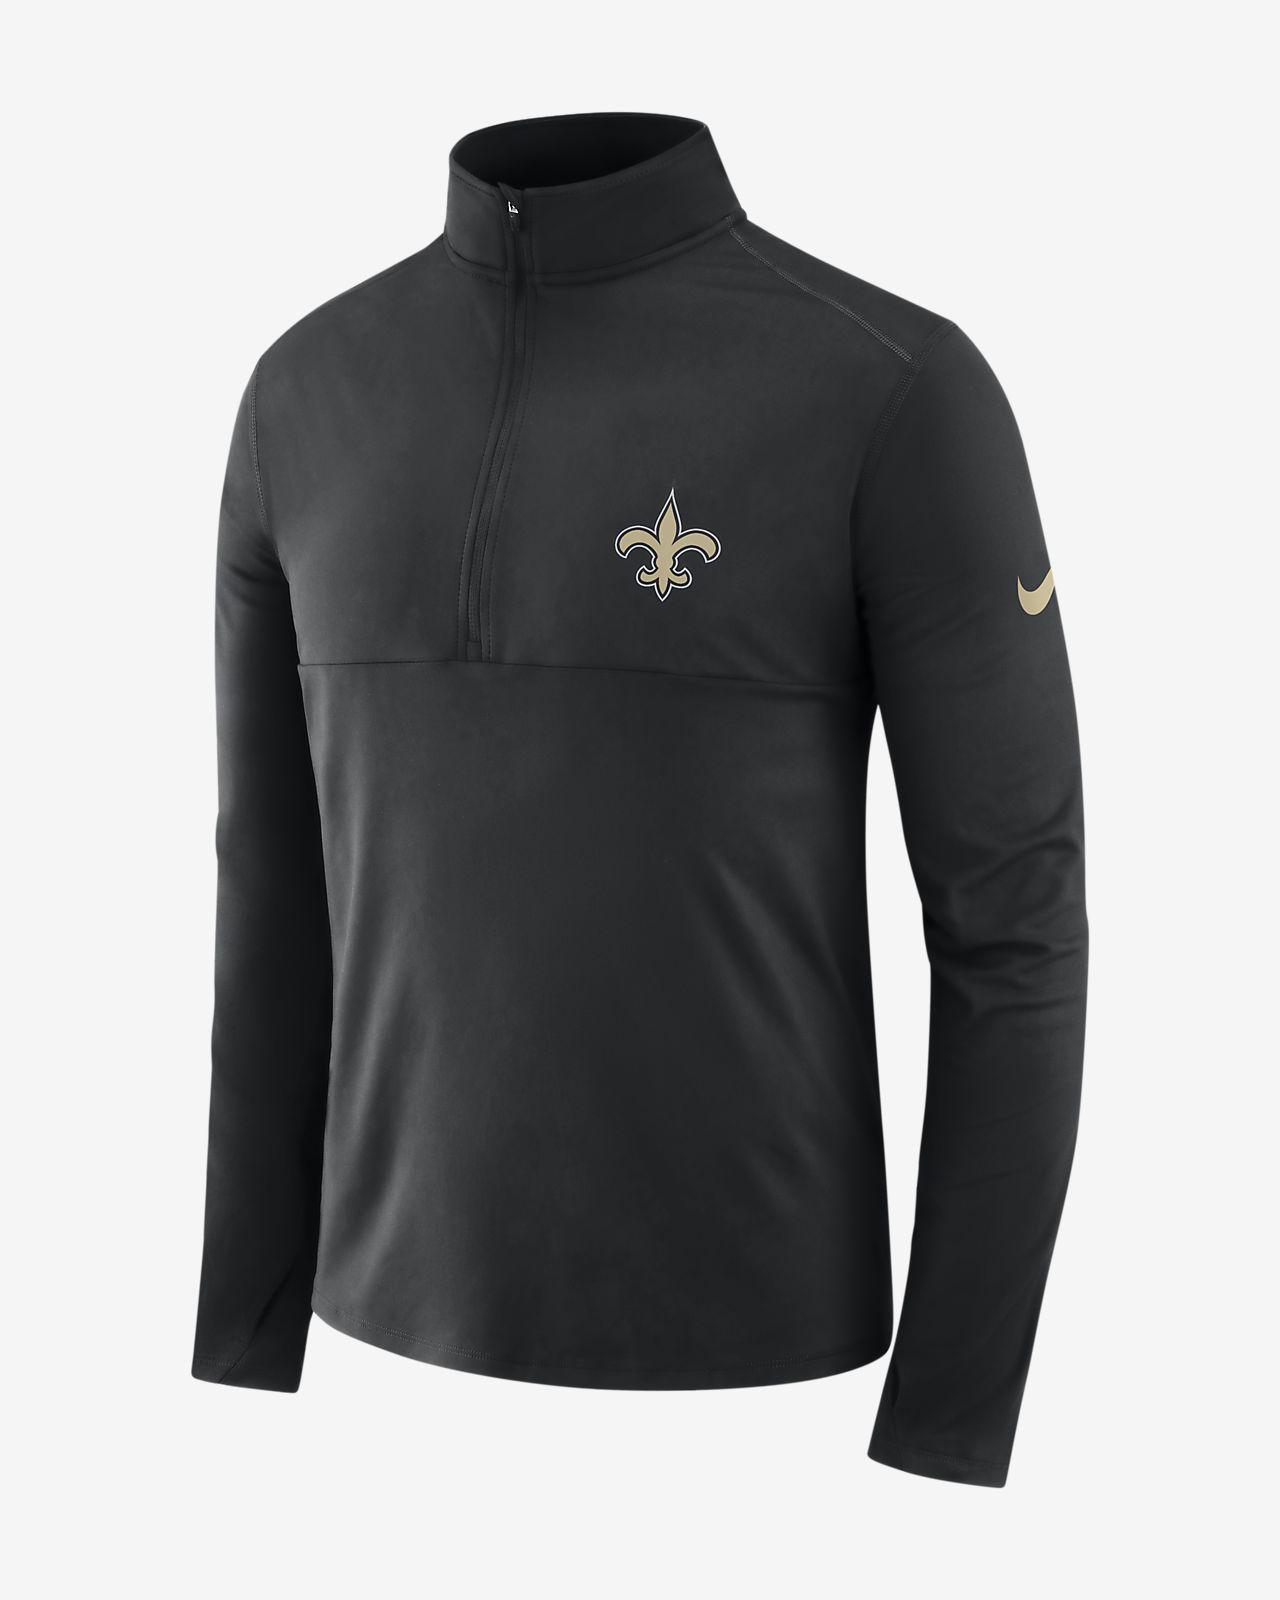 Nike Dri-FIT (NFL Saints) Men s Long-Sleeve Half-Zip Top. Nike.com 8c8c12908